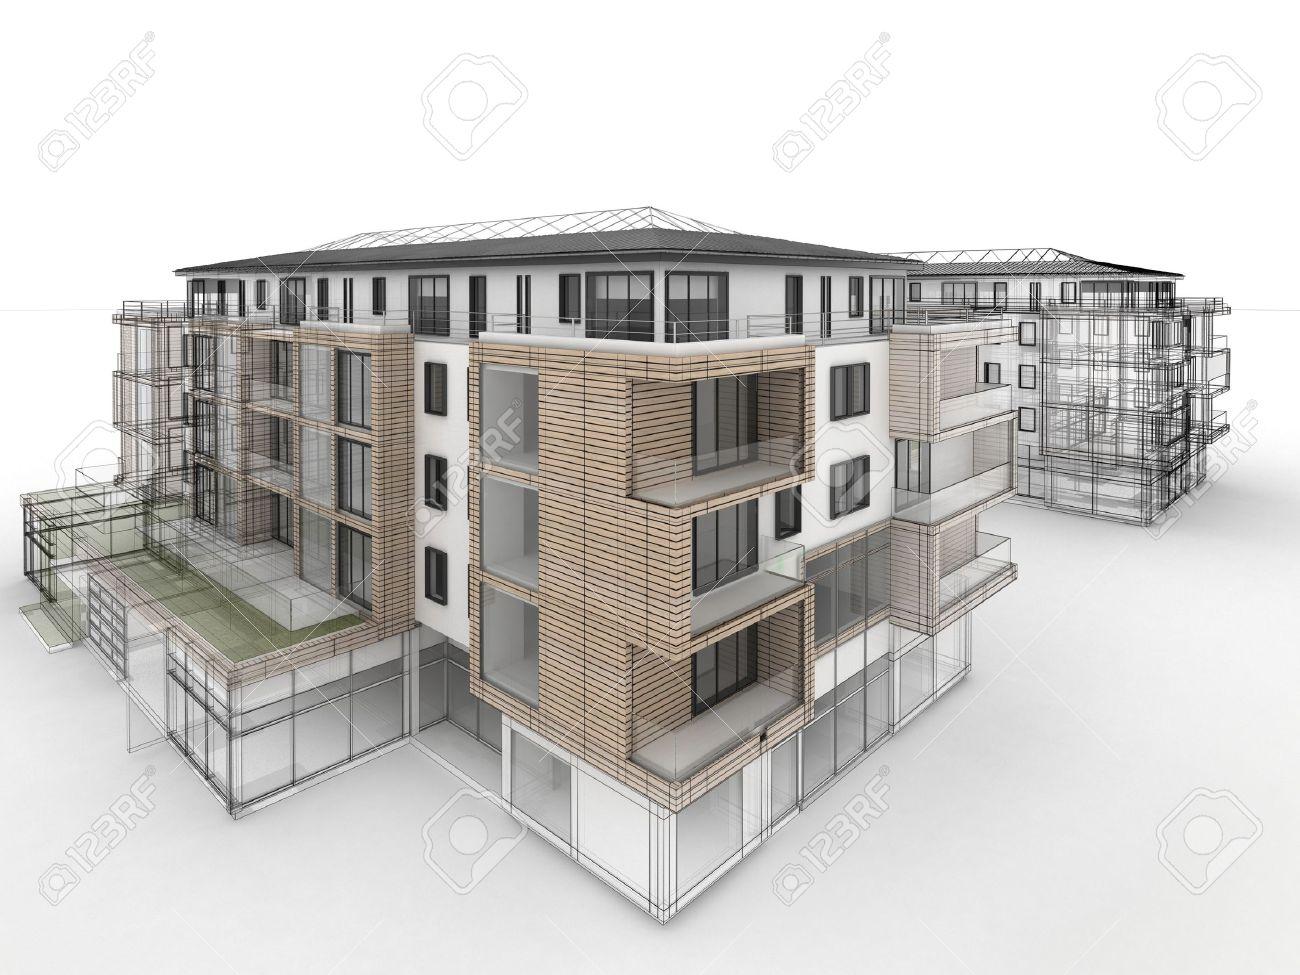 Apartment Building Design Drawing apartment building design progress, architecture visualization